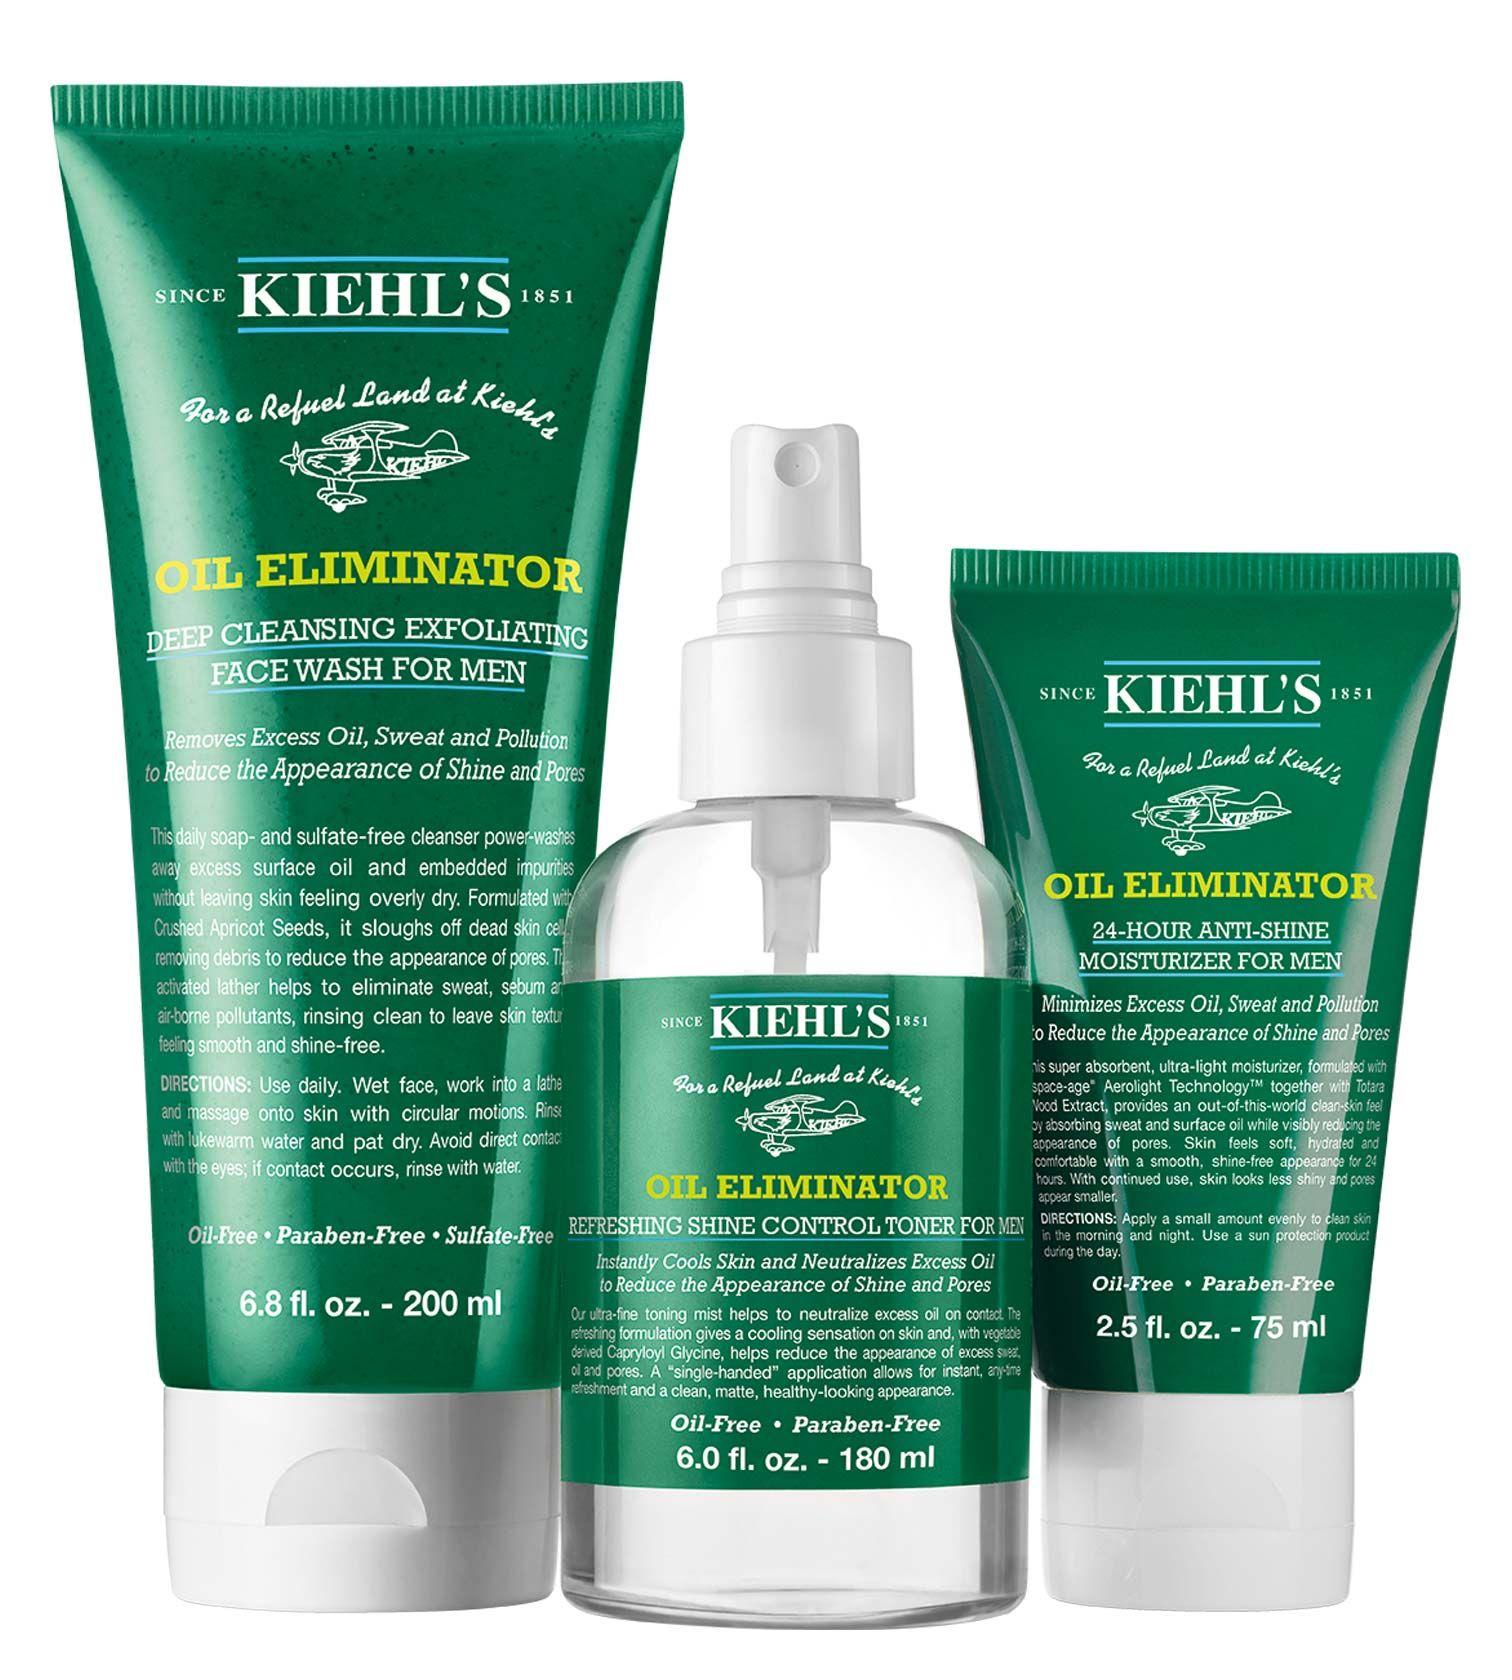 Oil Eliminator Shine Control Routine Skin Care Exfoliating Face Wash Shine Control Products